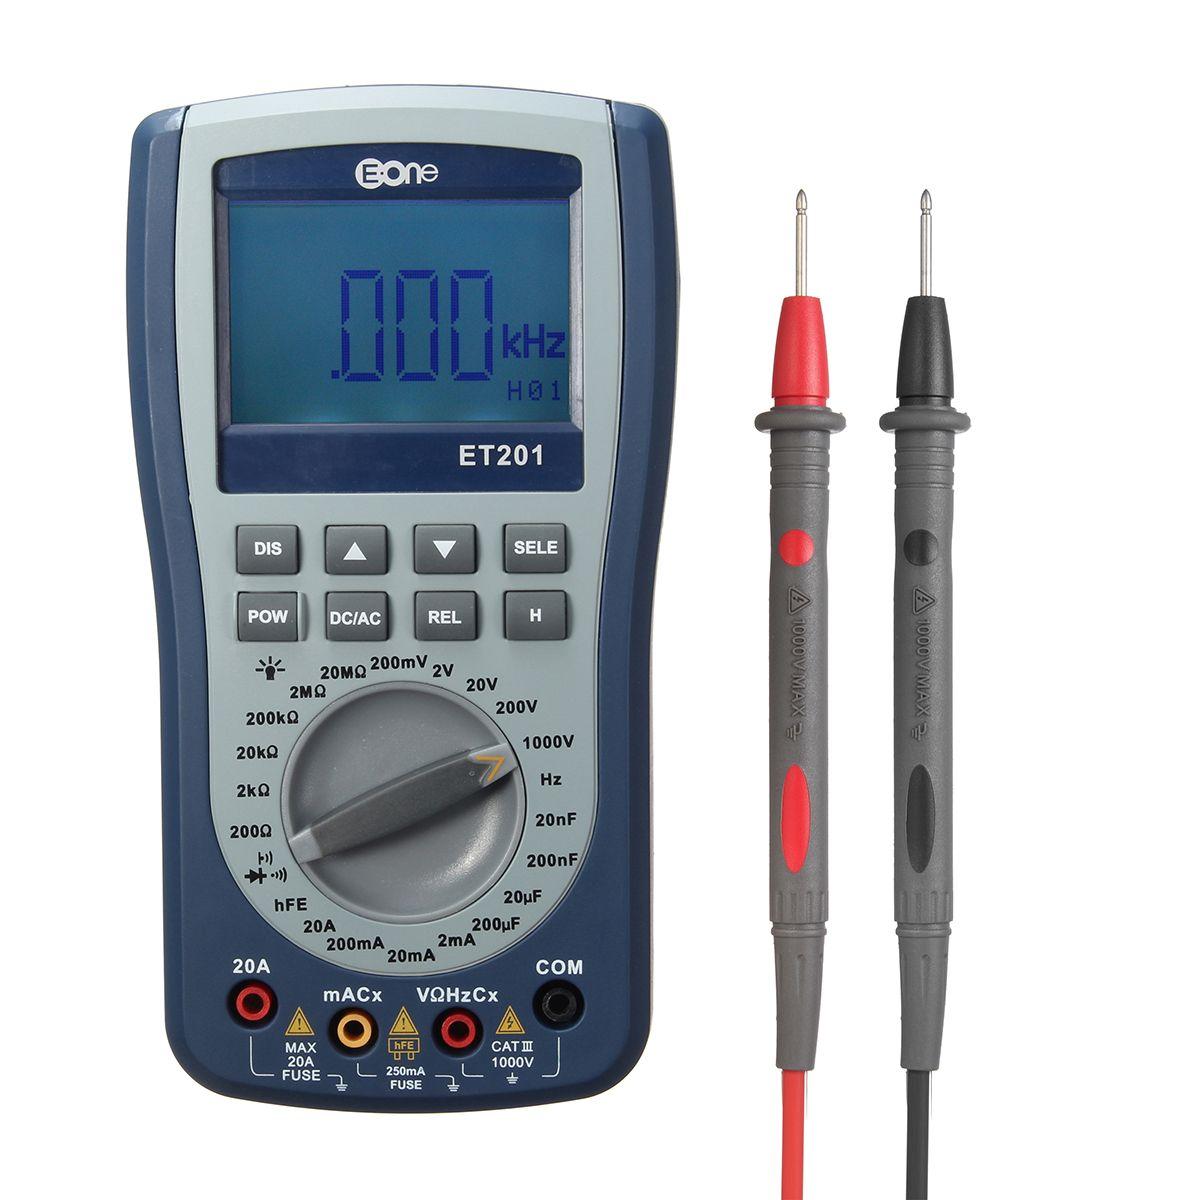 Eone Et201 2 In 1 Digital Intelligent Handheld Storage Oscilloscope Adapter Multimeter Ac Dc Current Voltage